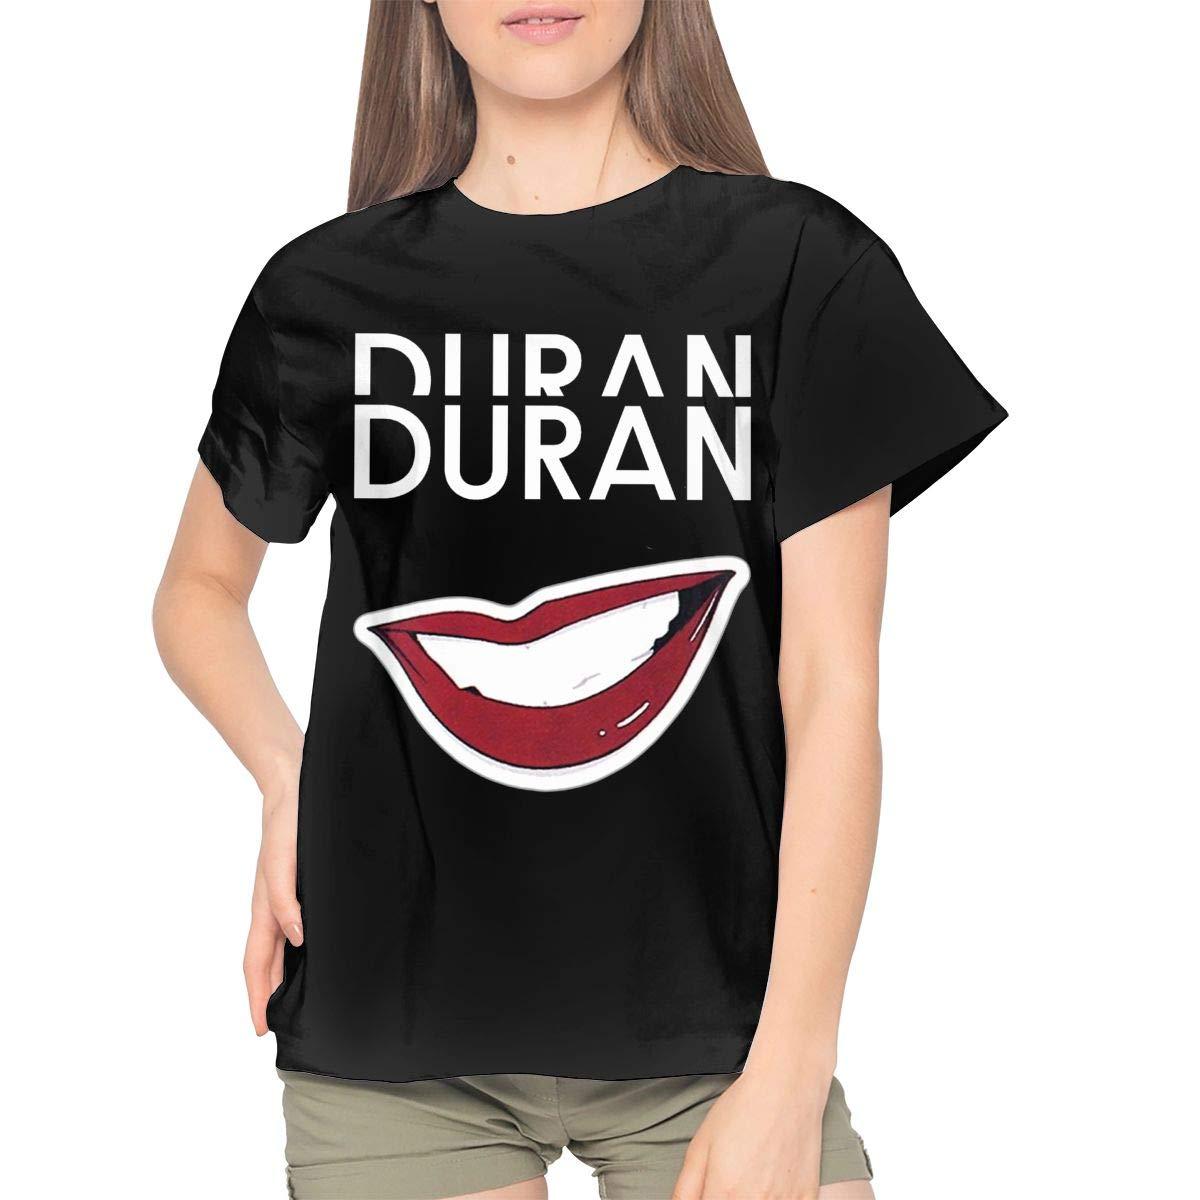 Duran Duran T Shirt Fashion Sports Casual Tops Round Neck Short Sleeve Tees